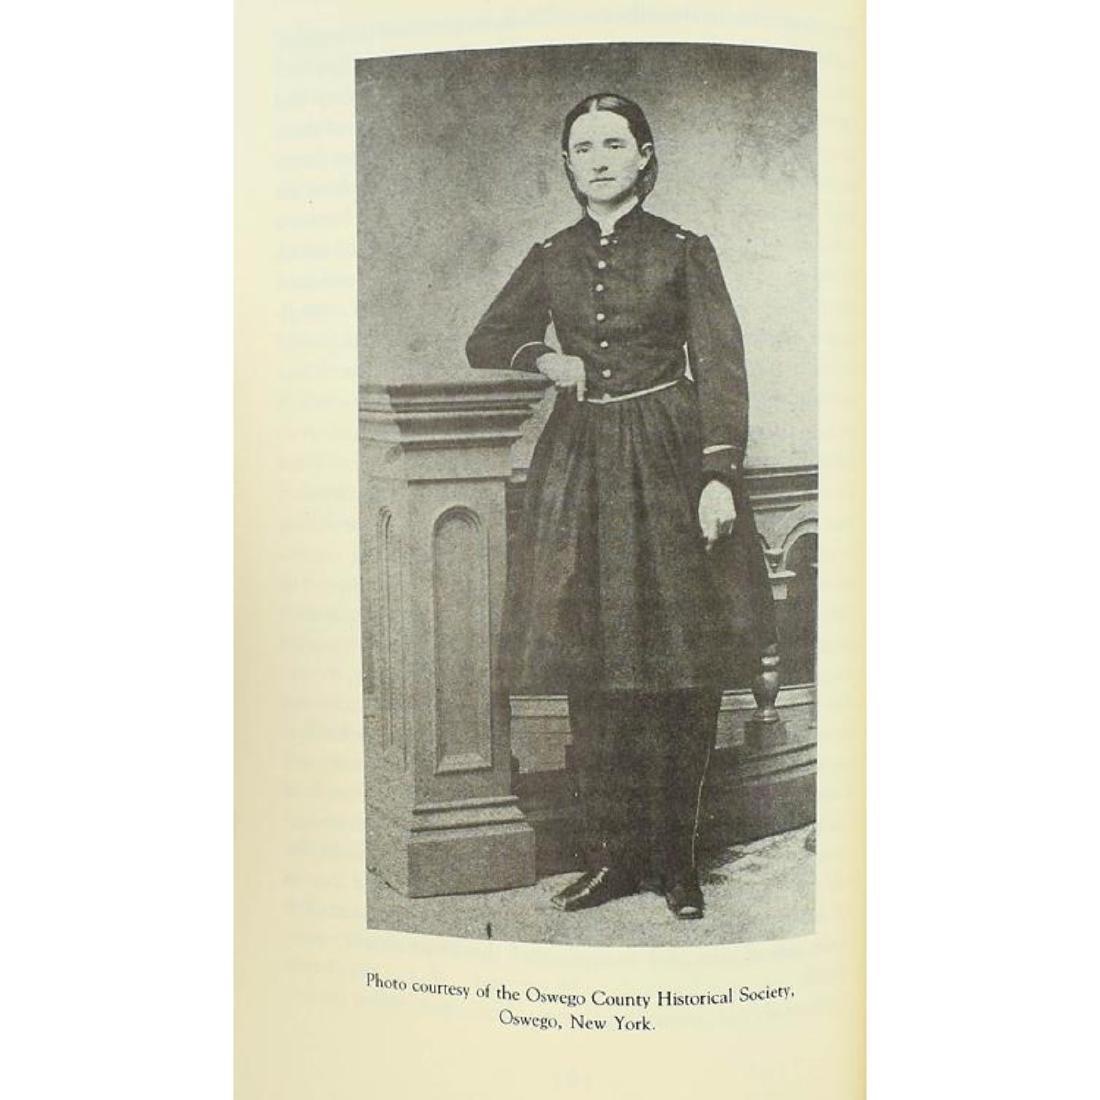 9v Battles American History Civil War History Books In - 3